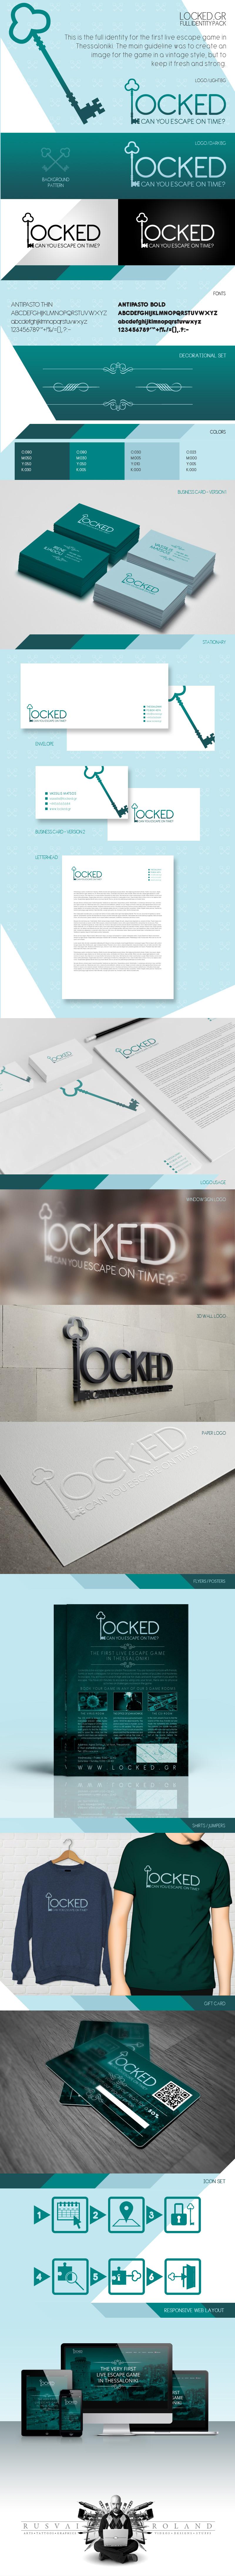 Locked.gr full graphic design identity and logo